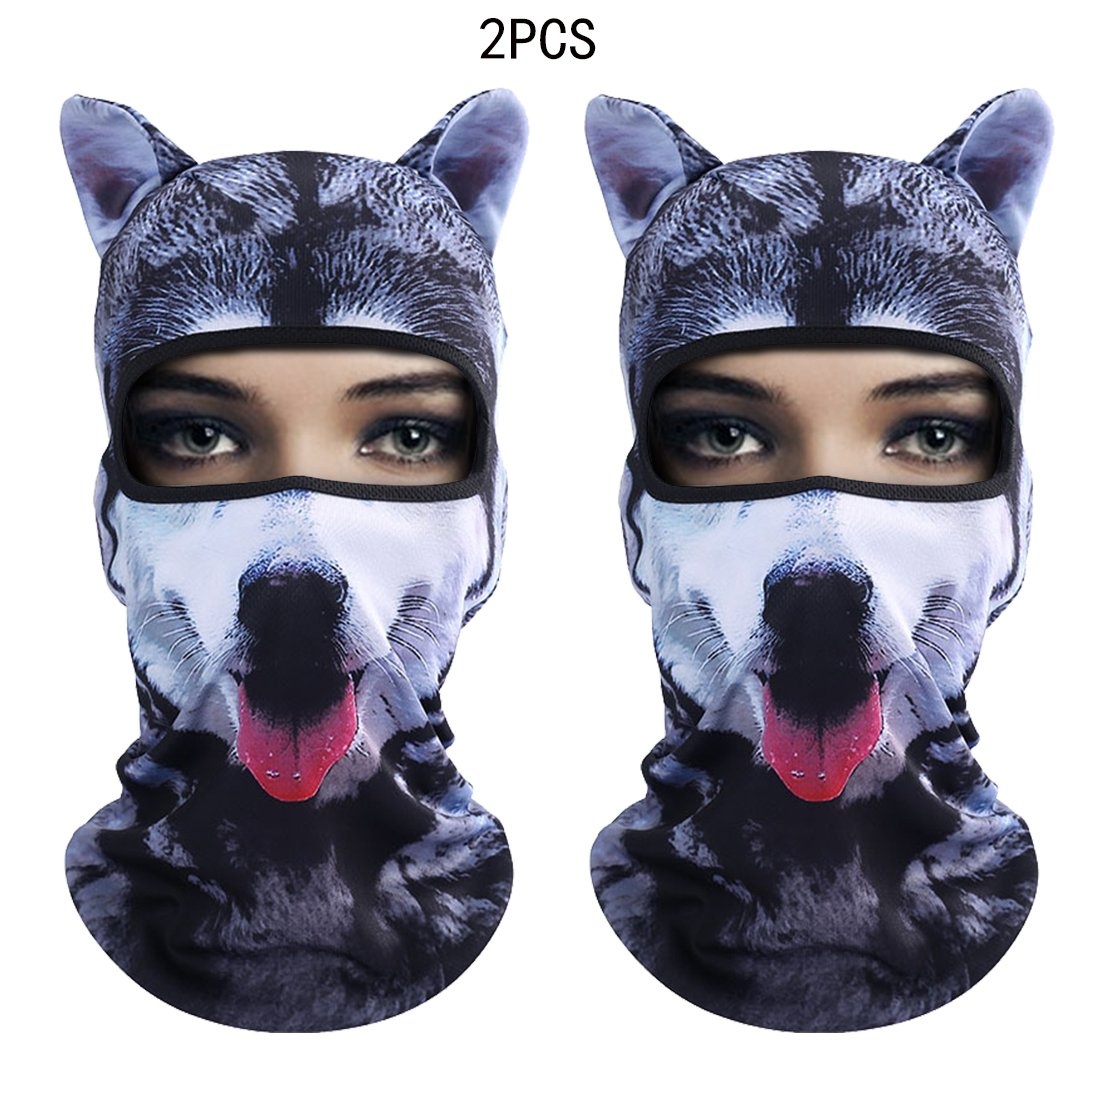 Outgeek Cat Mask, Women Men Balaclava Summer Full Face Hat Animal Ears Sports Helmet Climbing Fishing Cap (2PCS Dogs) by Outgeek (Image #1)